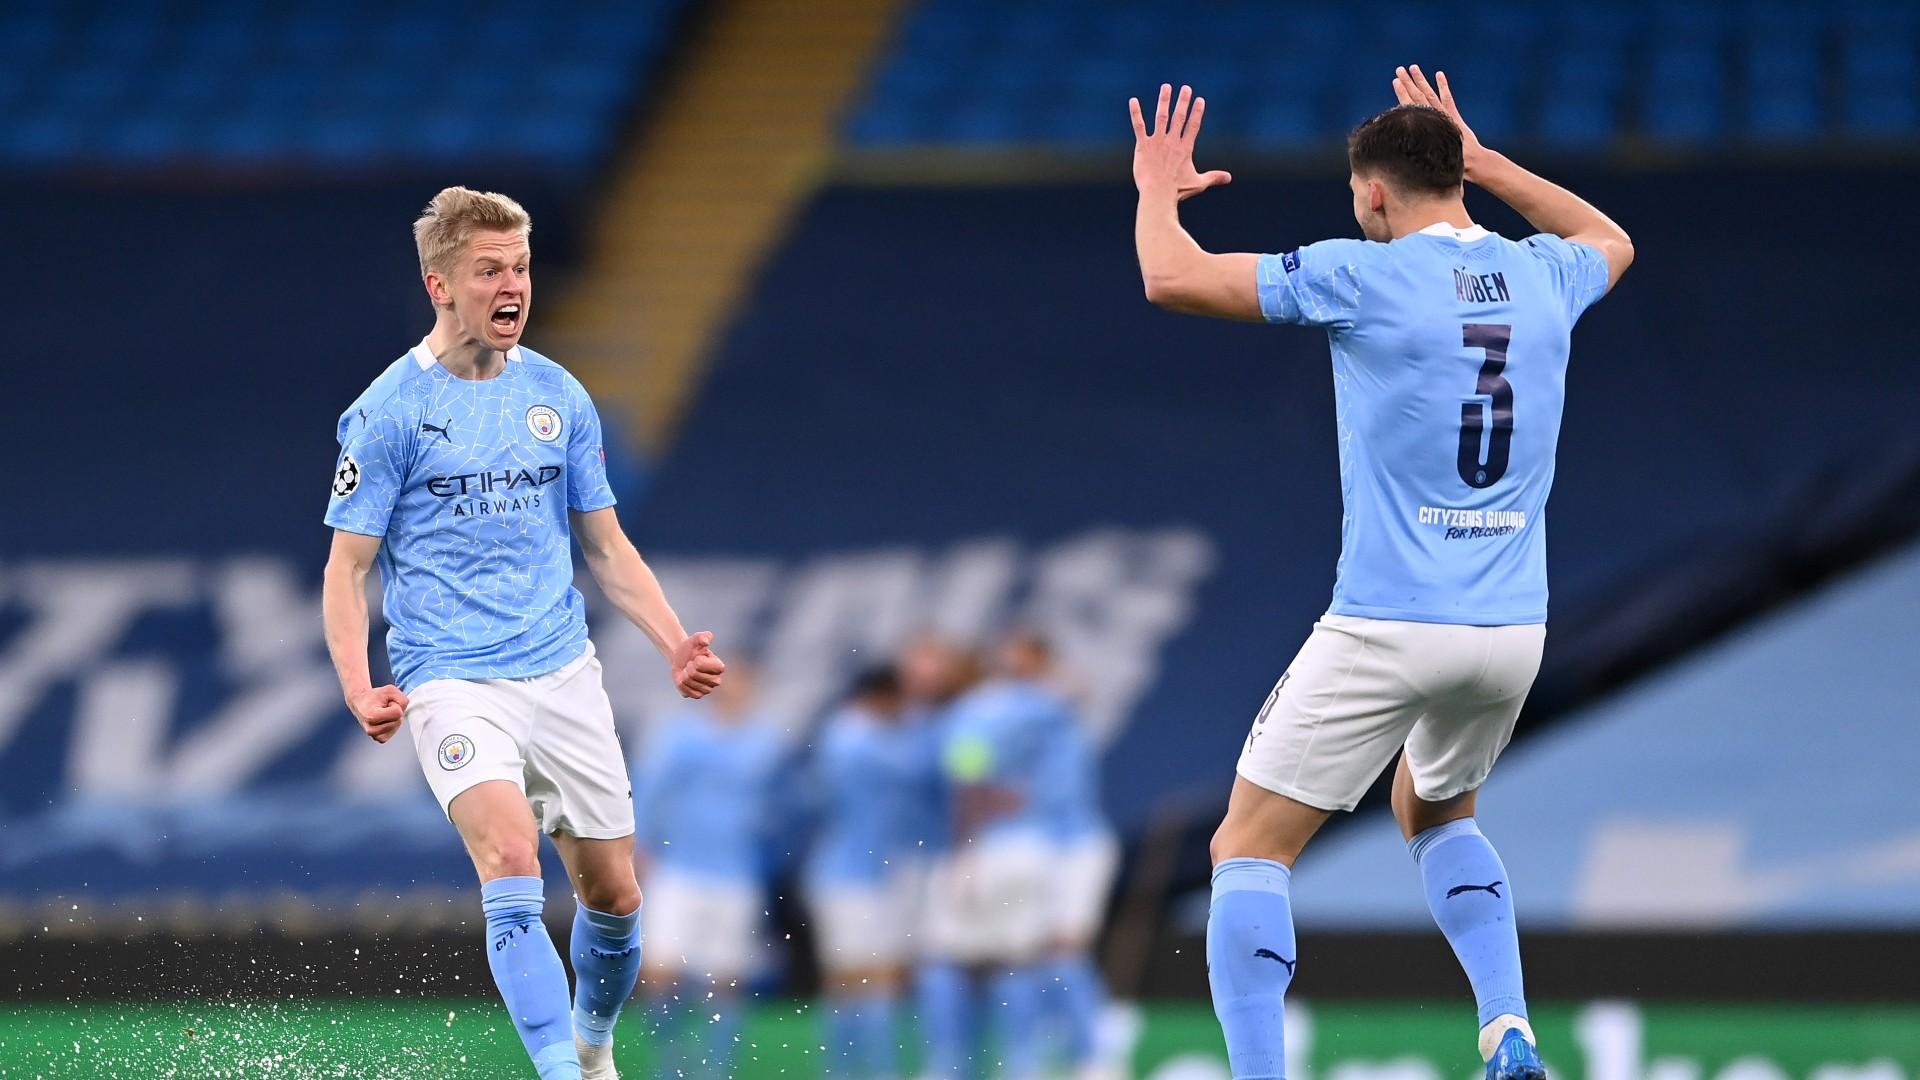 Man City come through blizzard of chaos to reach maiden Champions League final